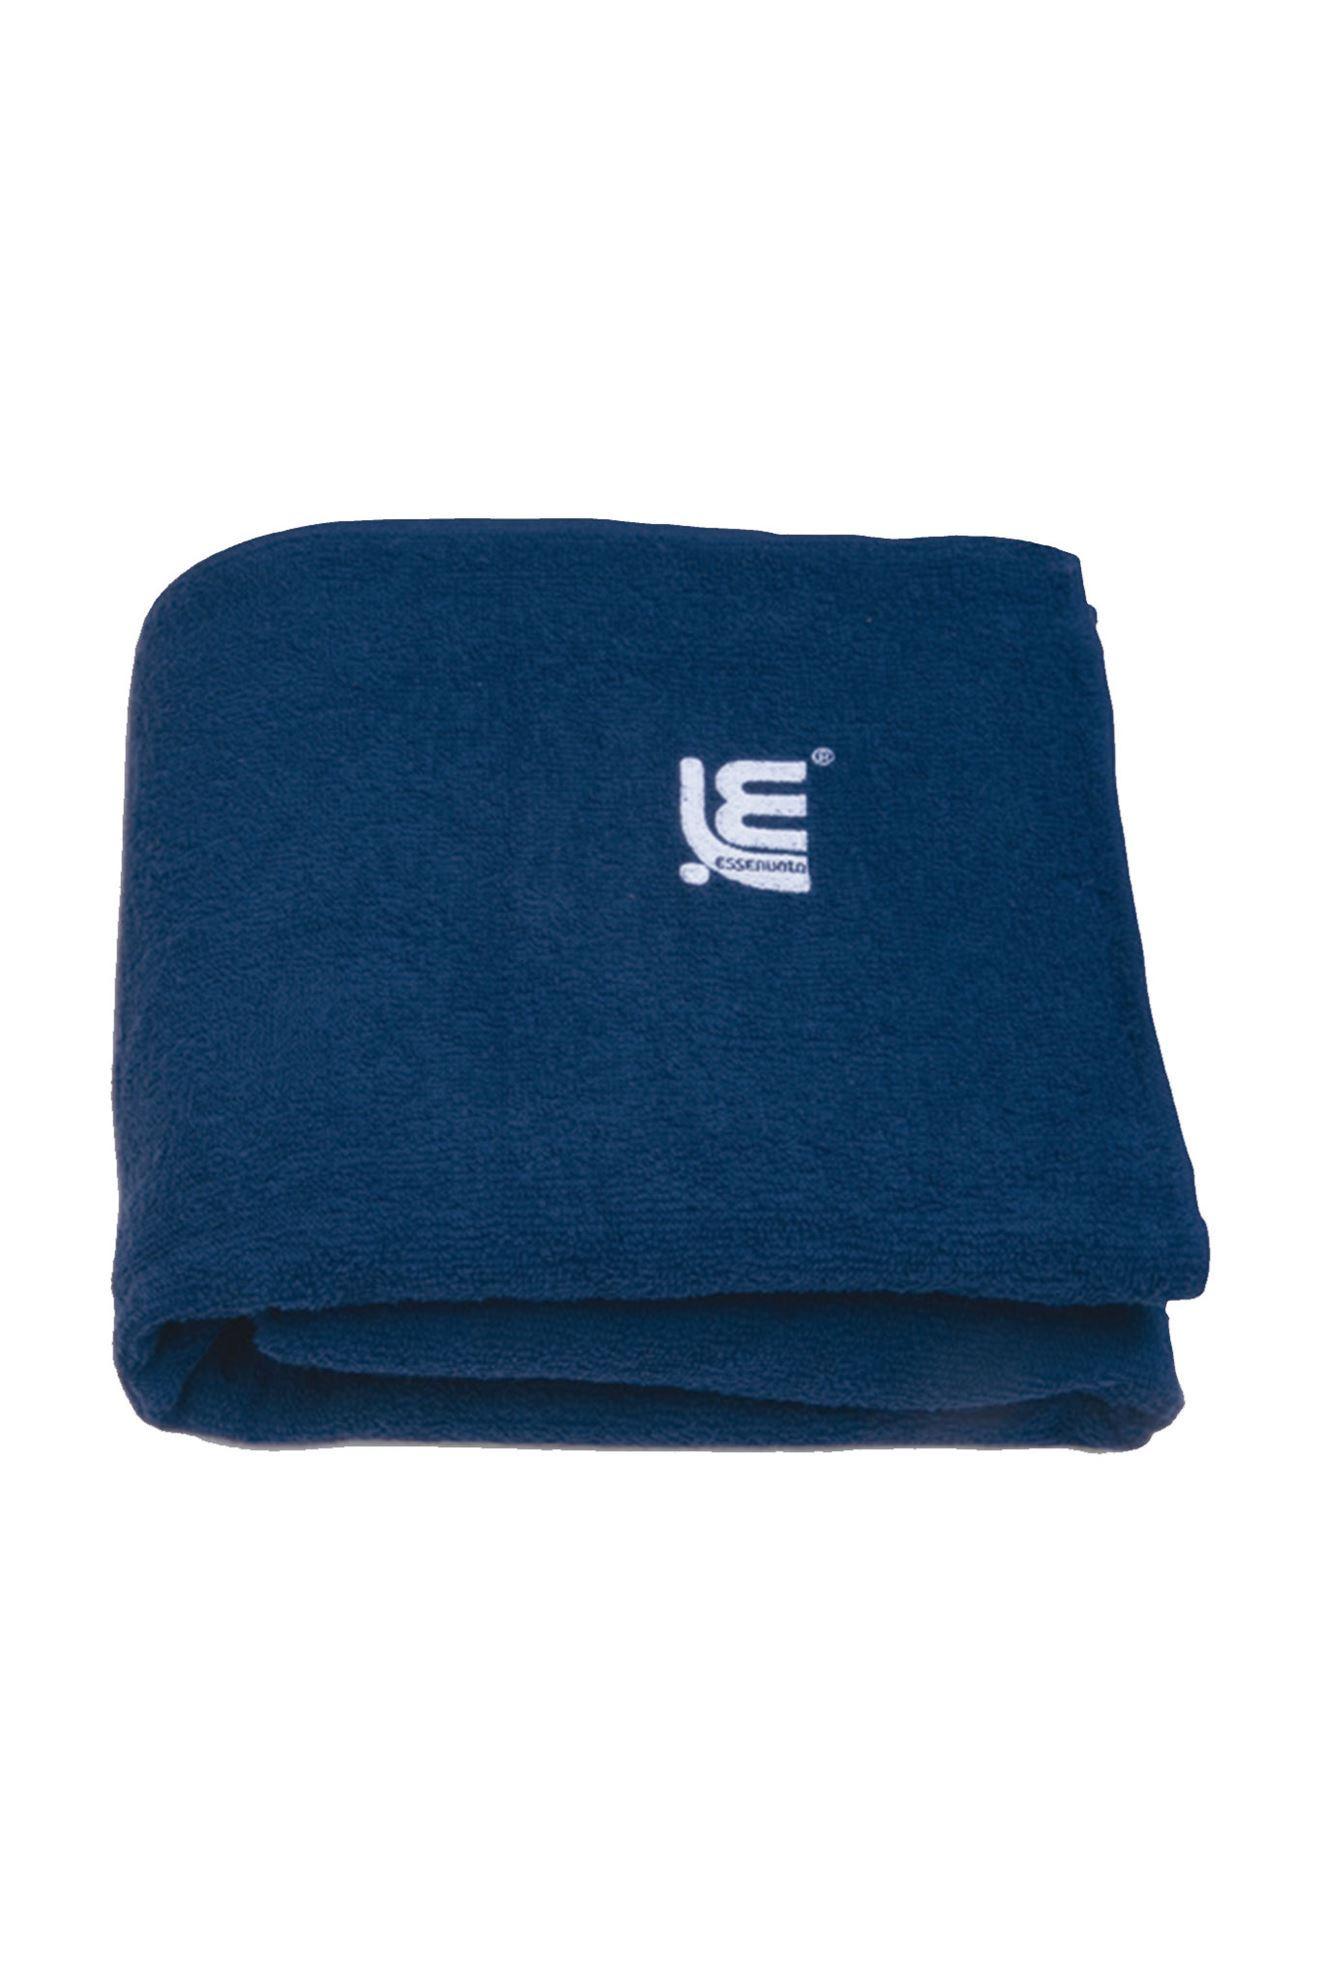 204003 PLAIN COLOUR TOWEL DARK BLUE 60X105 CM